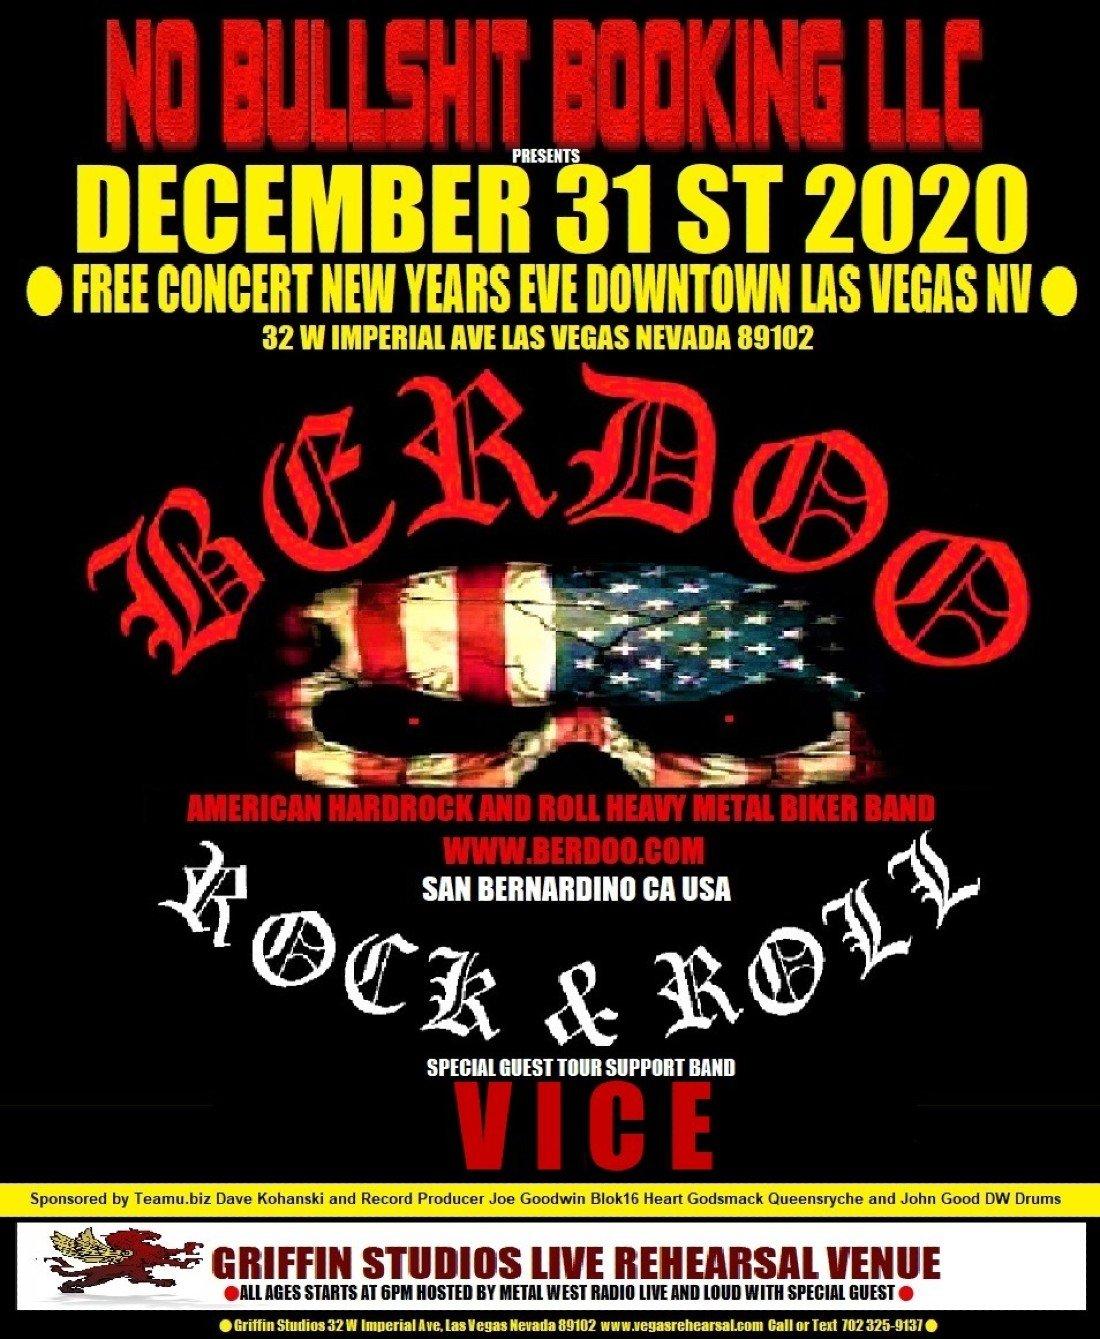 BERDOO FREE CONCERT NEW YEARS EVE DEC 31ST 2020 DOWNTOWN LAS VEGAS, 31 December | Event in Las Vegas | AllEvents.in